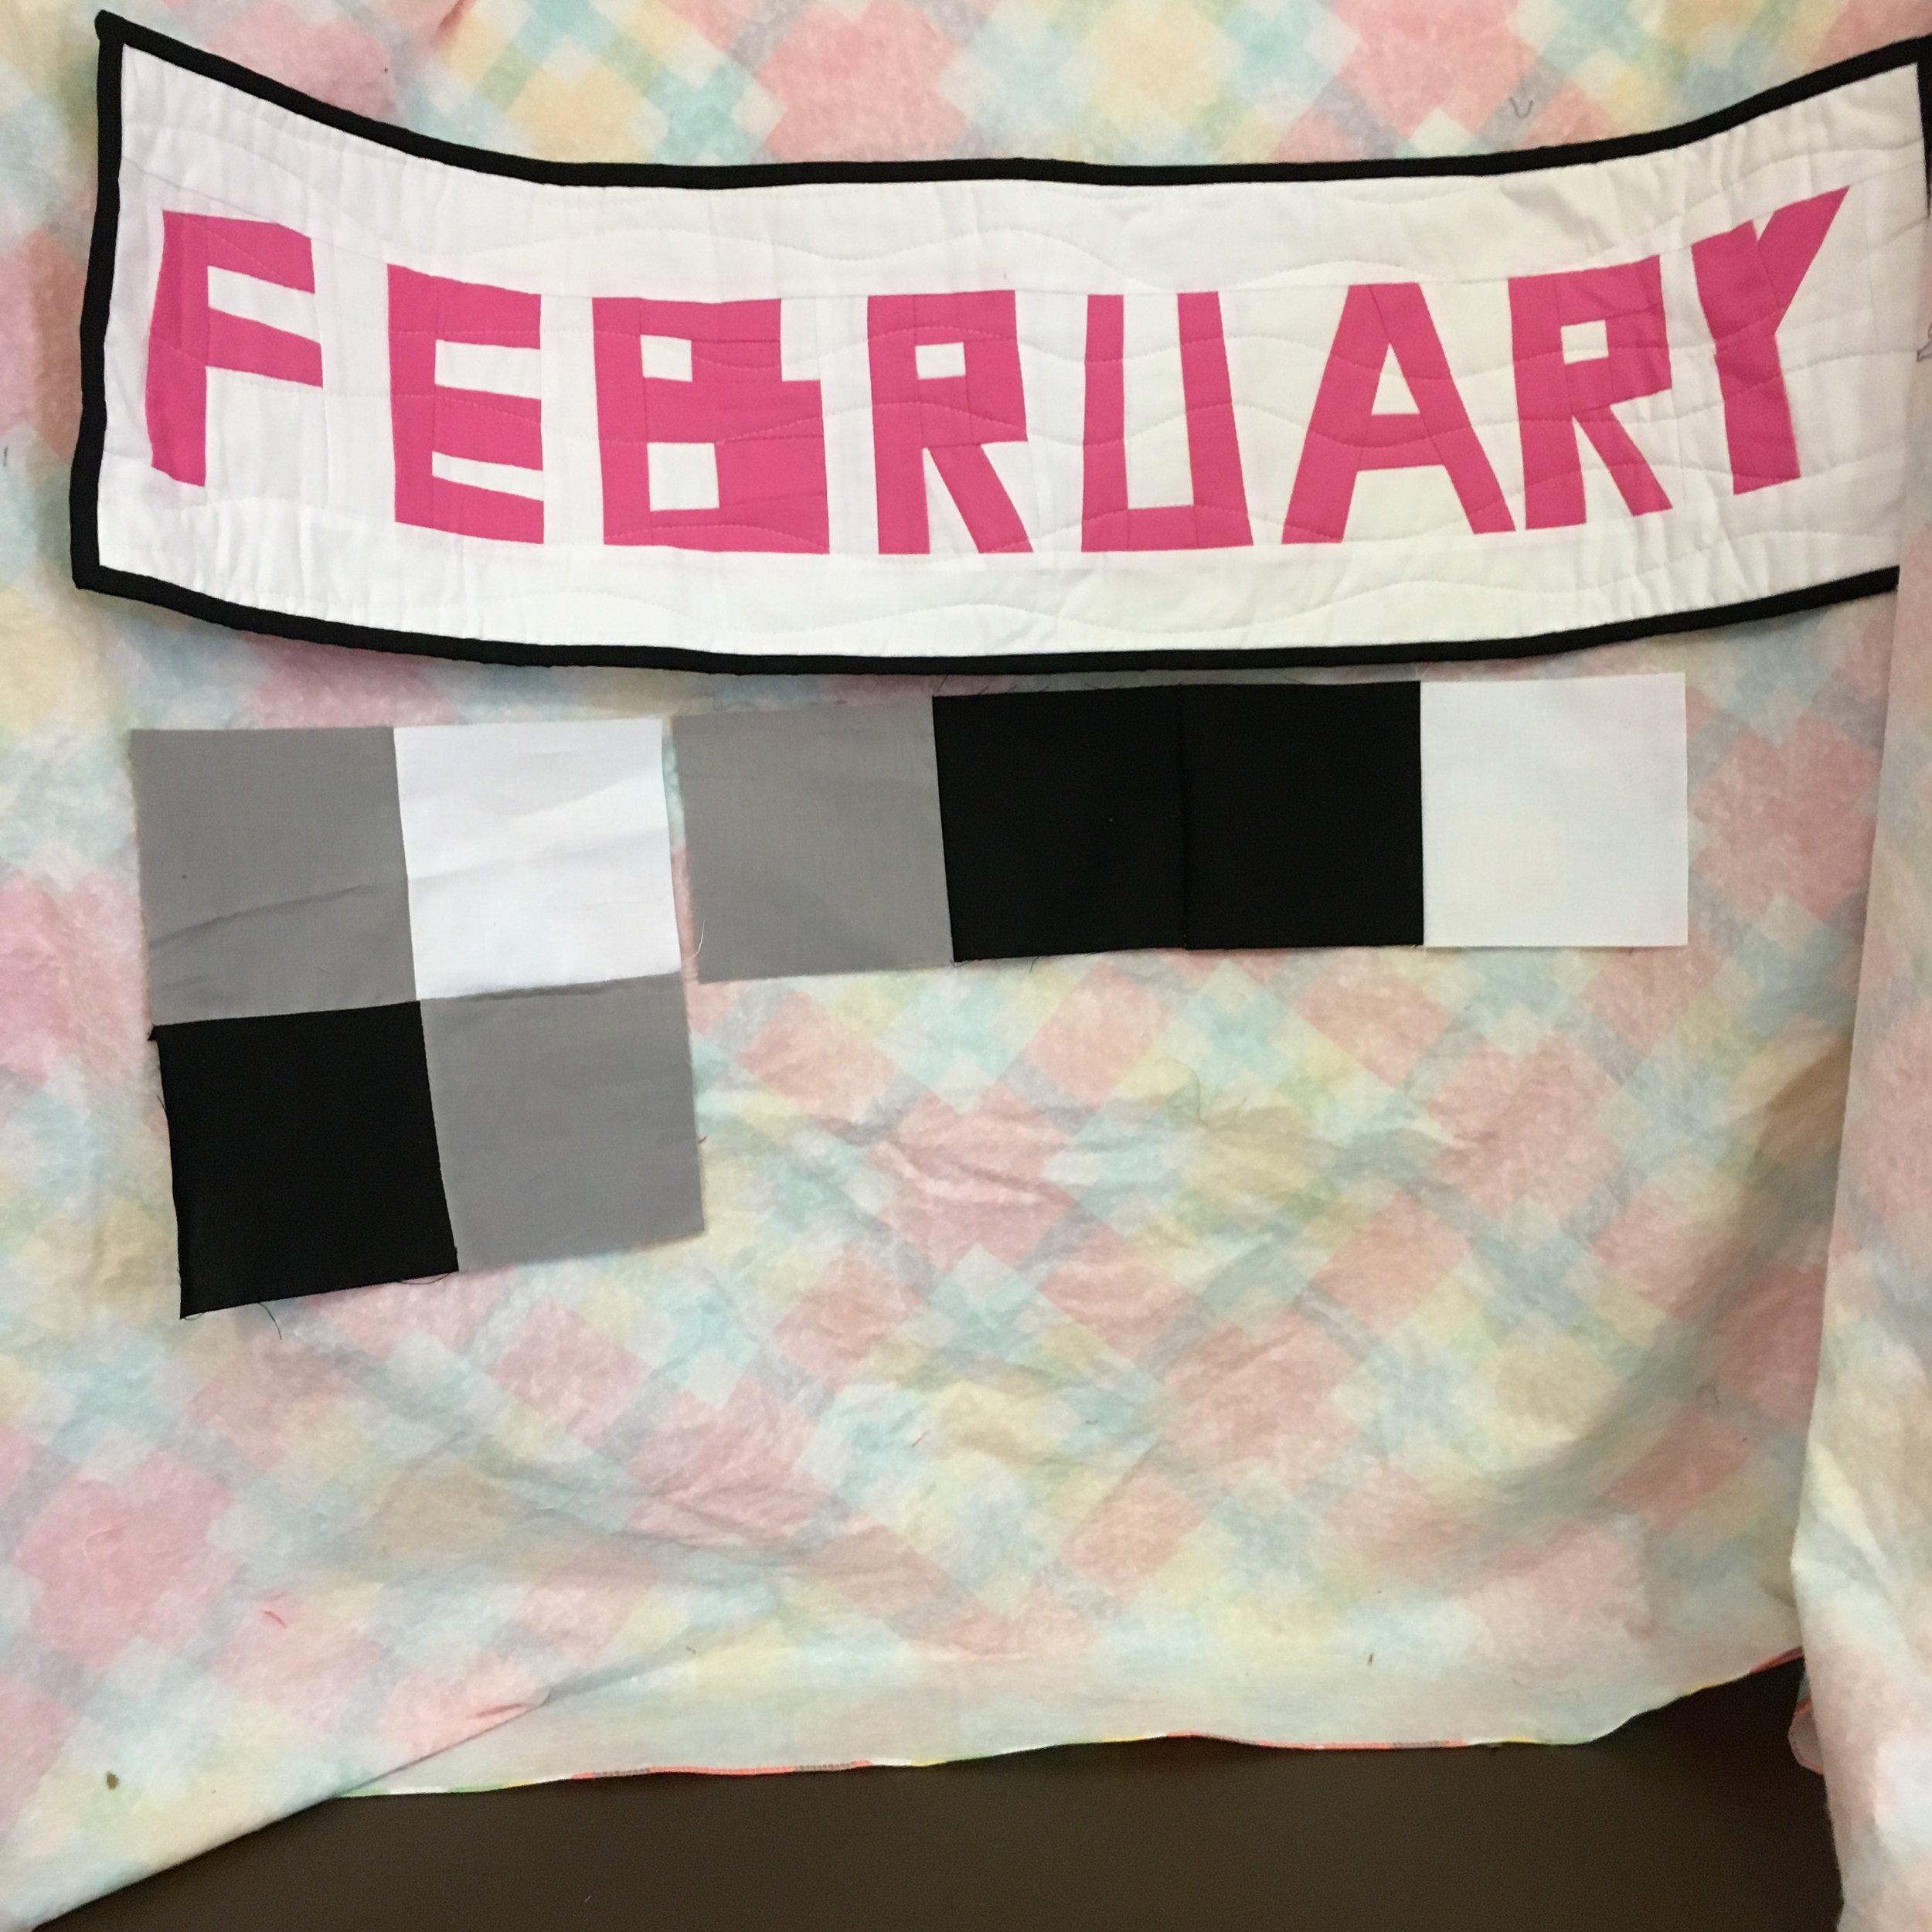 Photo Feb 16, 1 37 31 PM.jpg